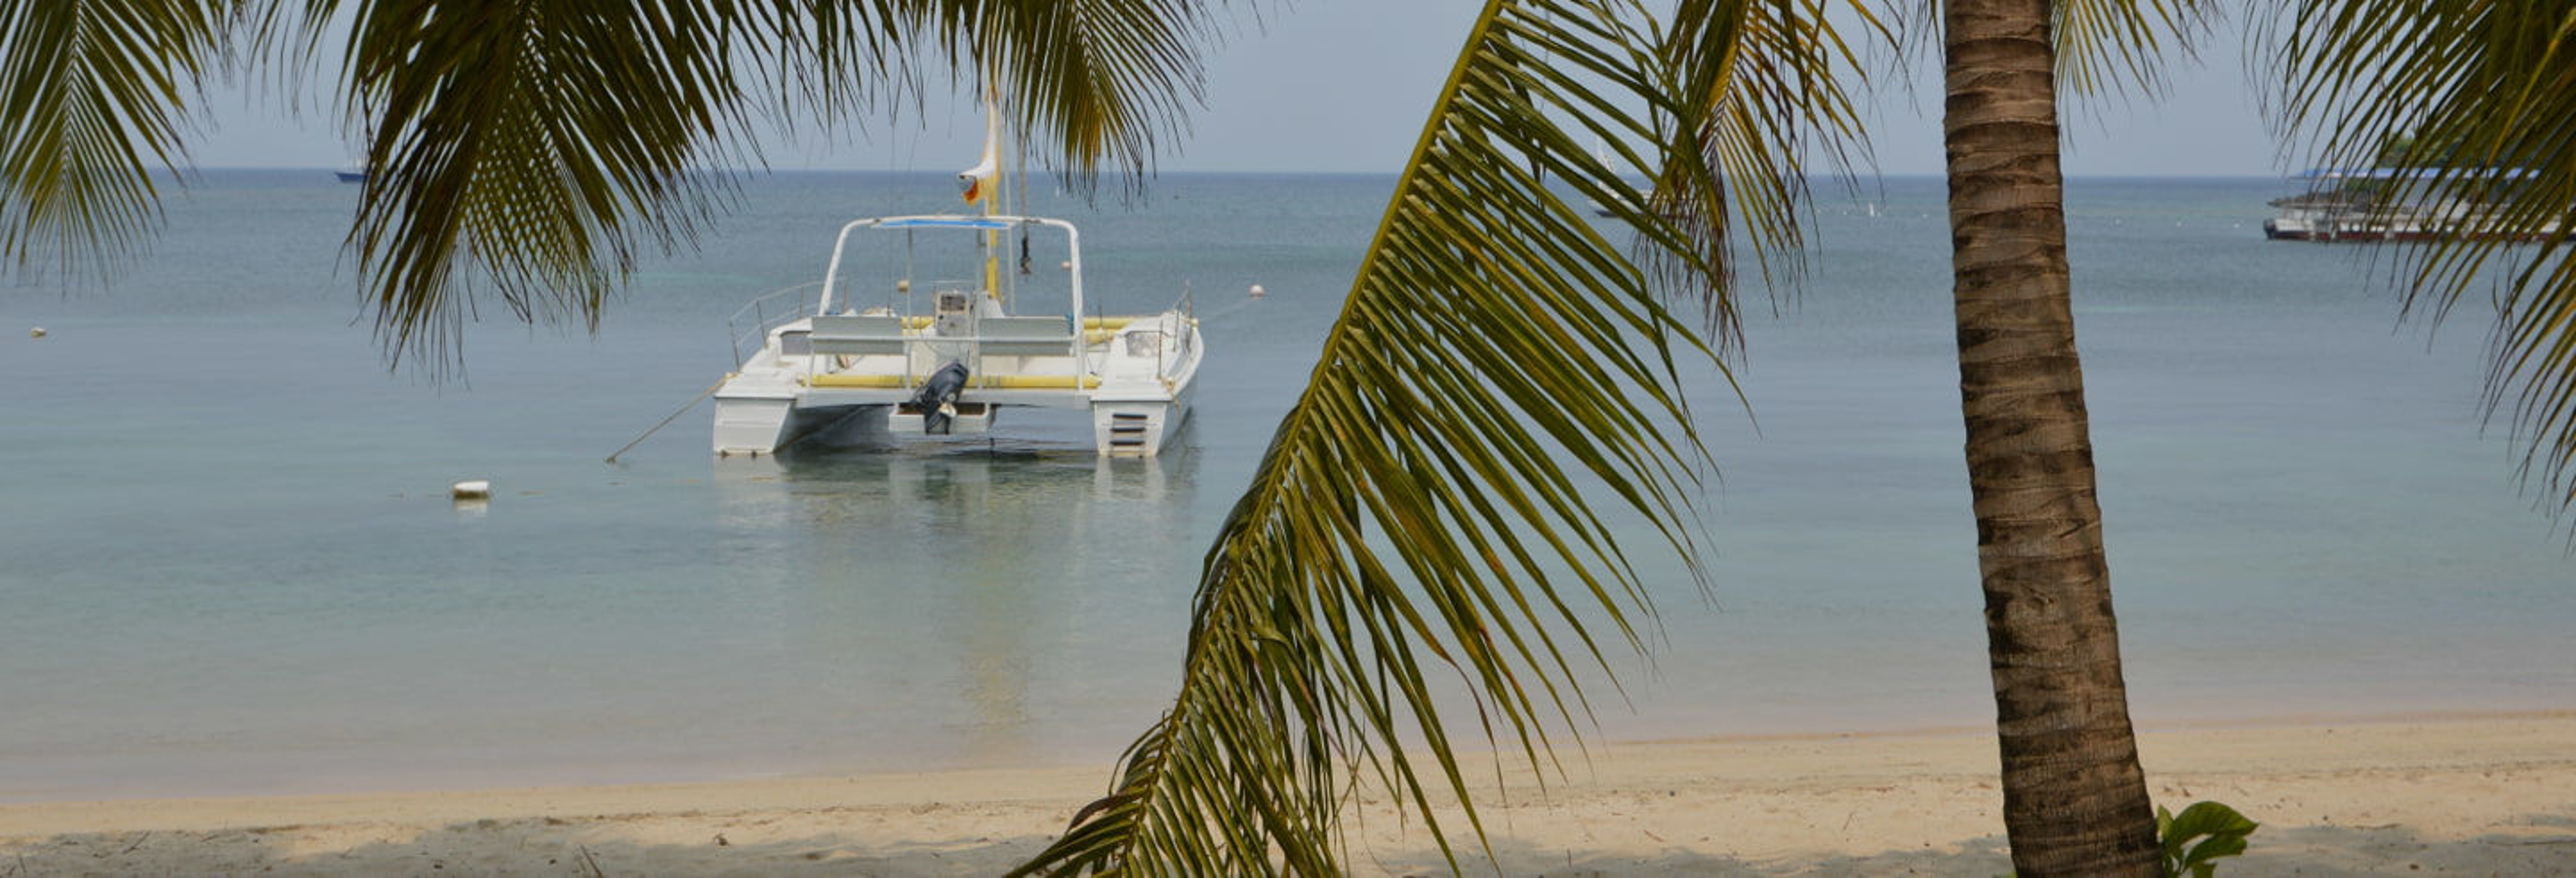 Tour di Roatán in un catamarano di lusso